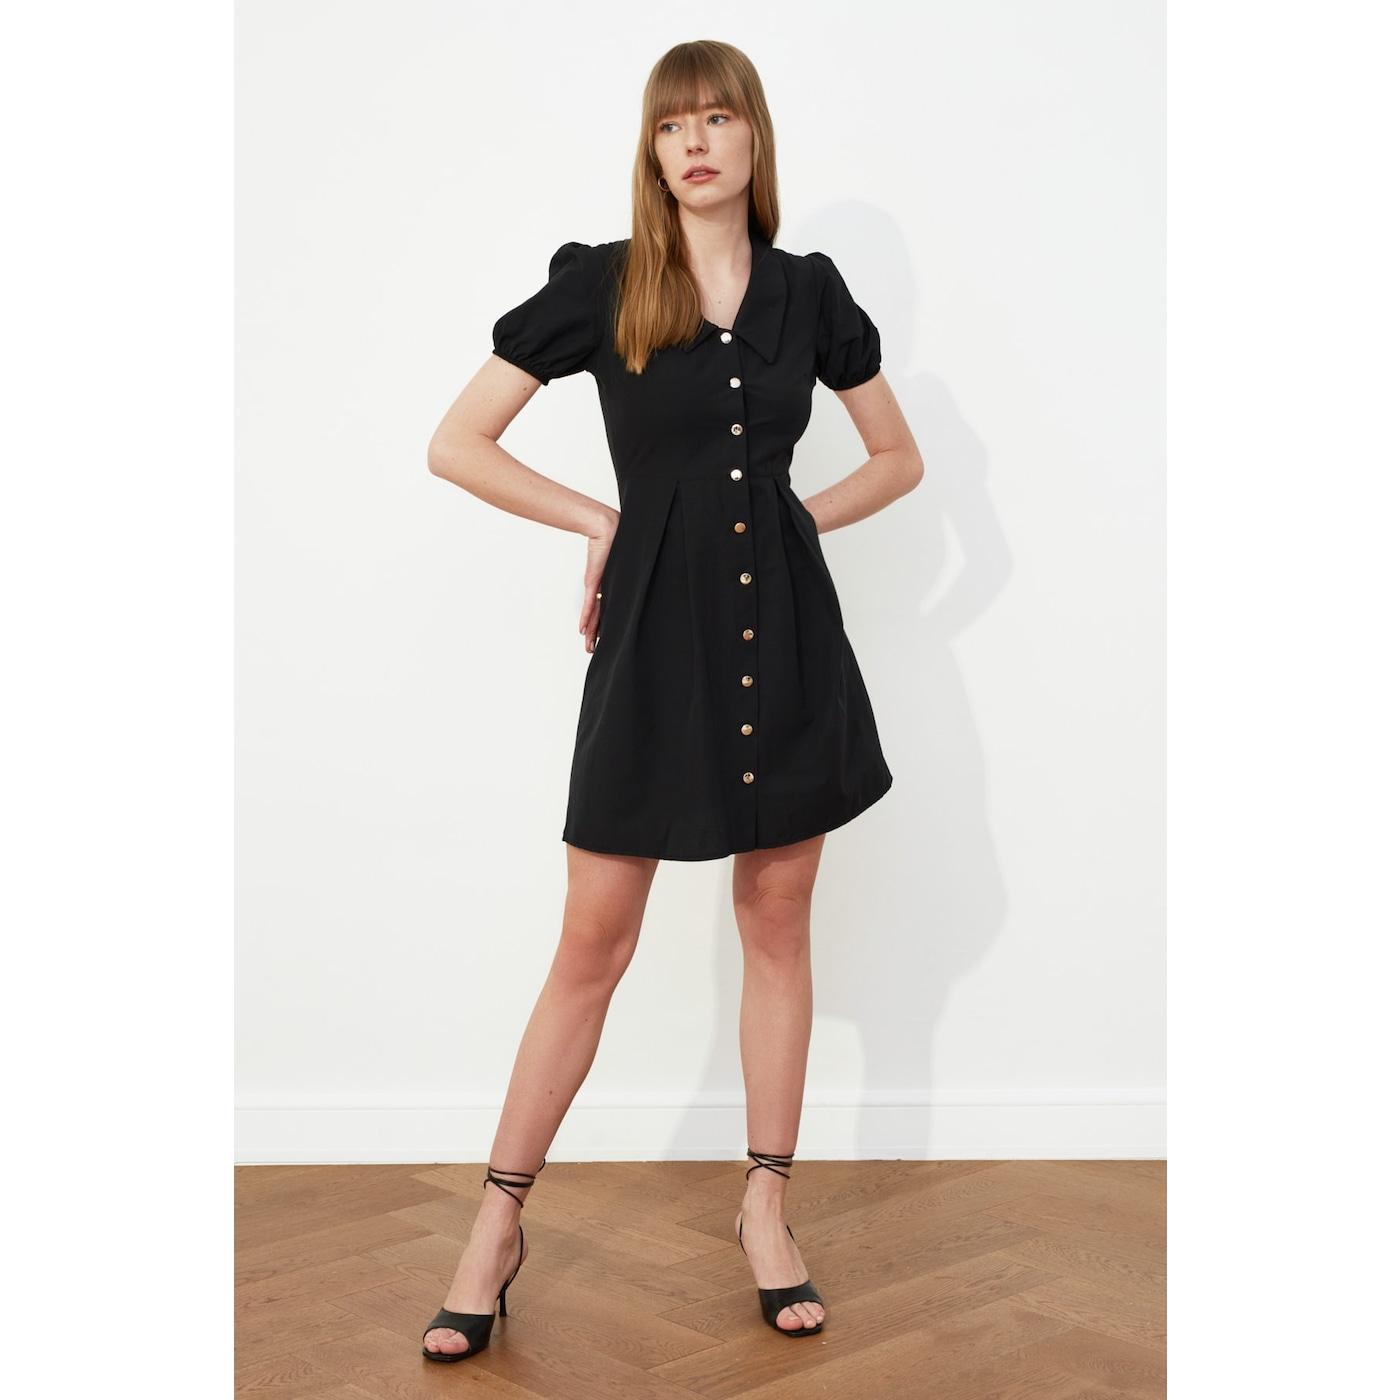 Trendyol Black Collar Detailed Buttoned Dress dámské 38